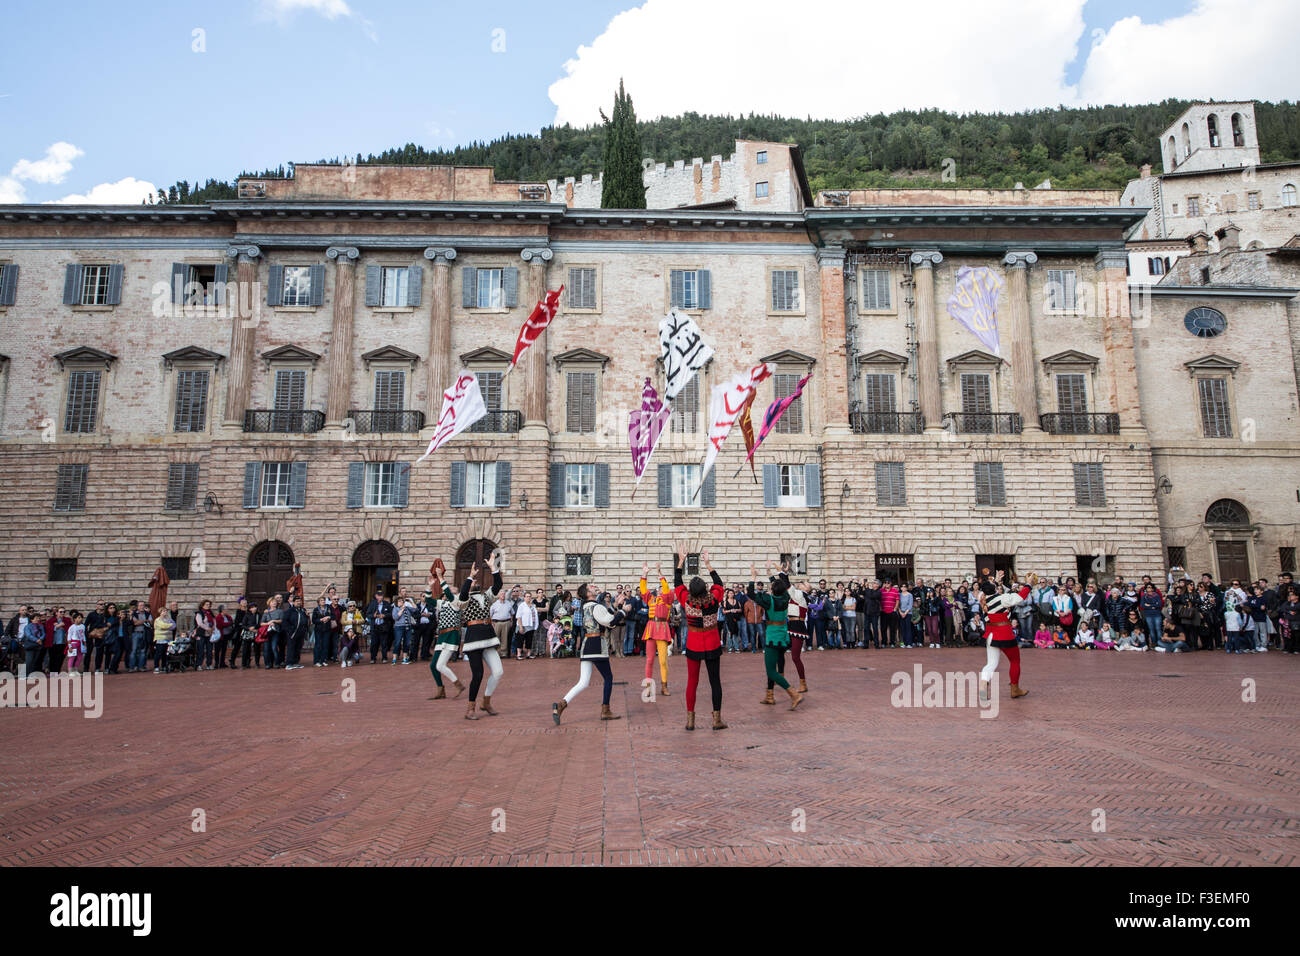 Festival del Medioevo, Gubbio - Stock Image